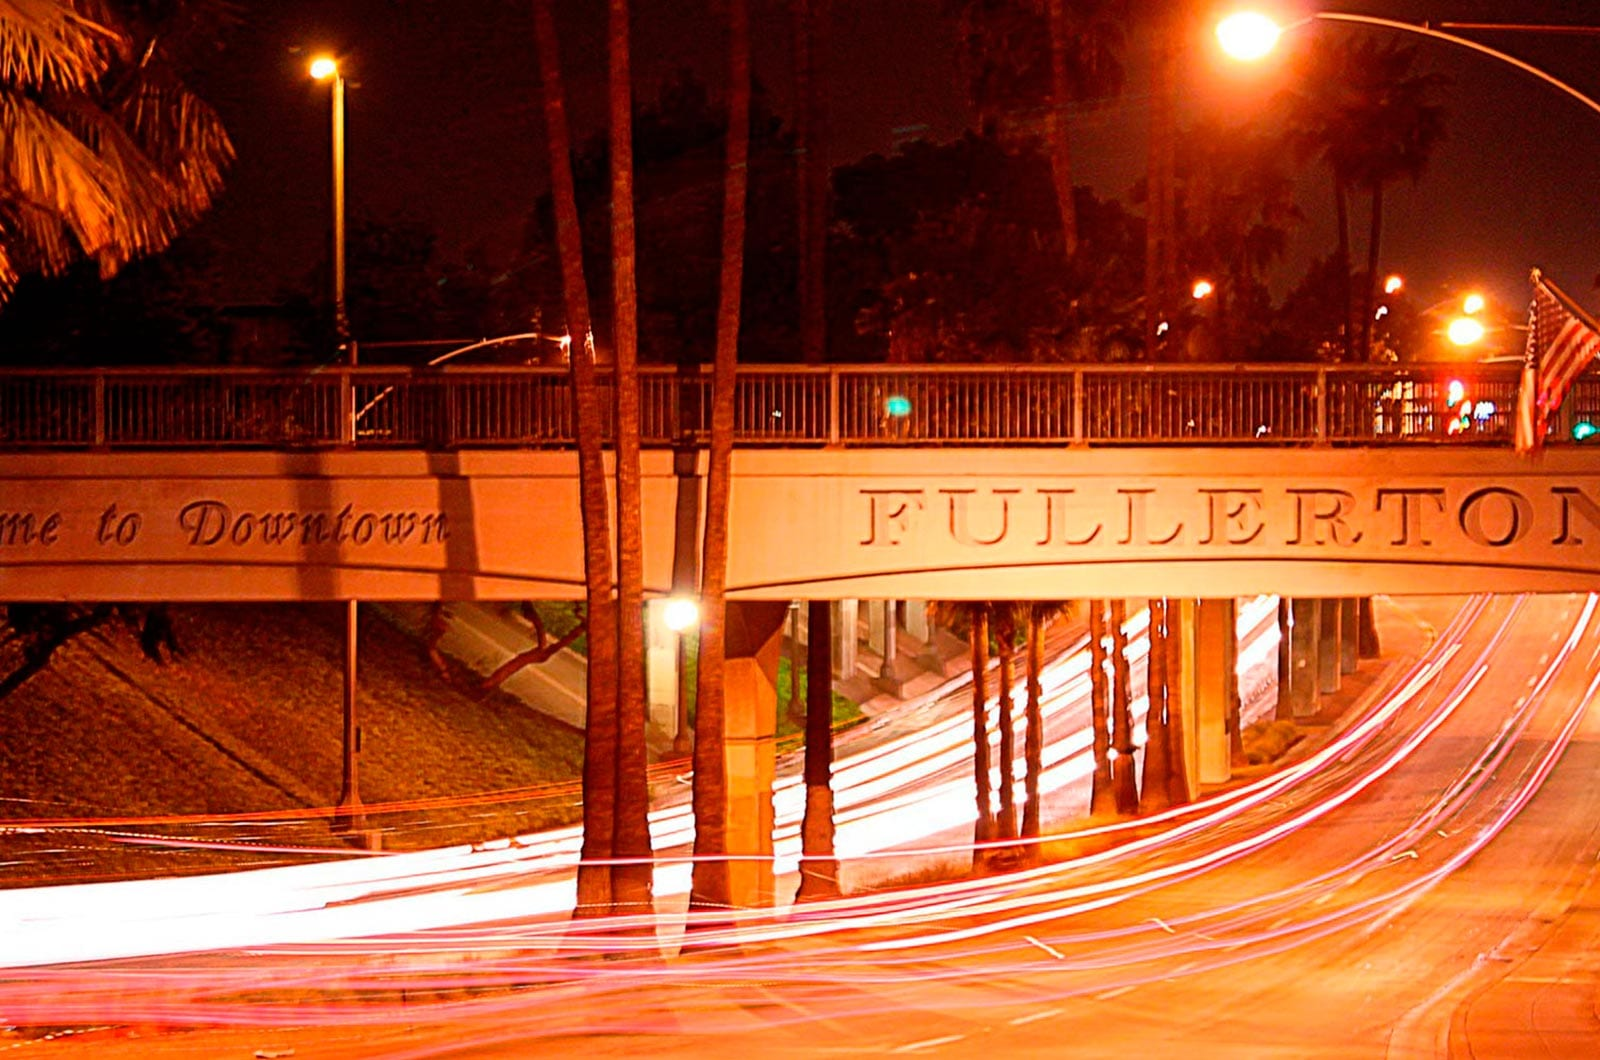 Fullerton Matterport 3D Tour Service Provider | Fullerton Virtual Tour Photographer